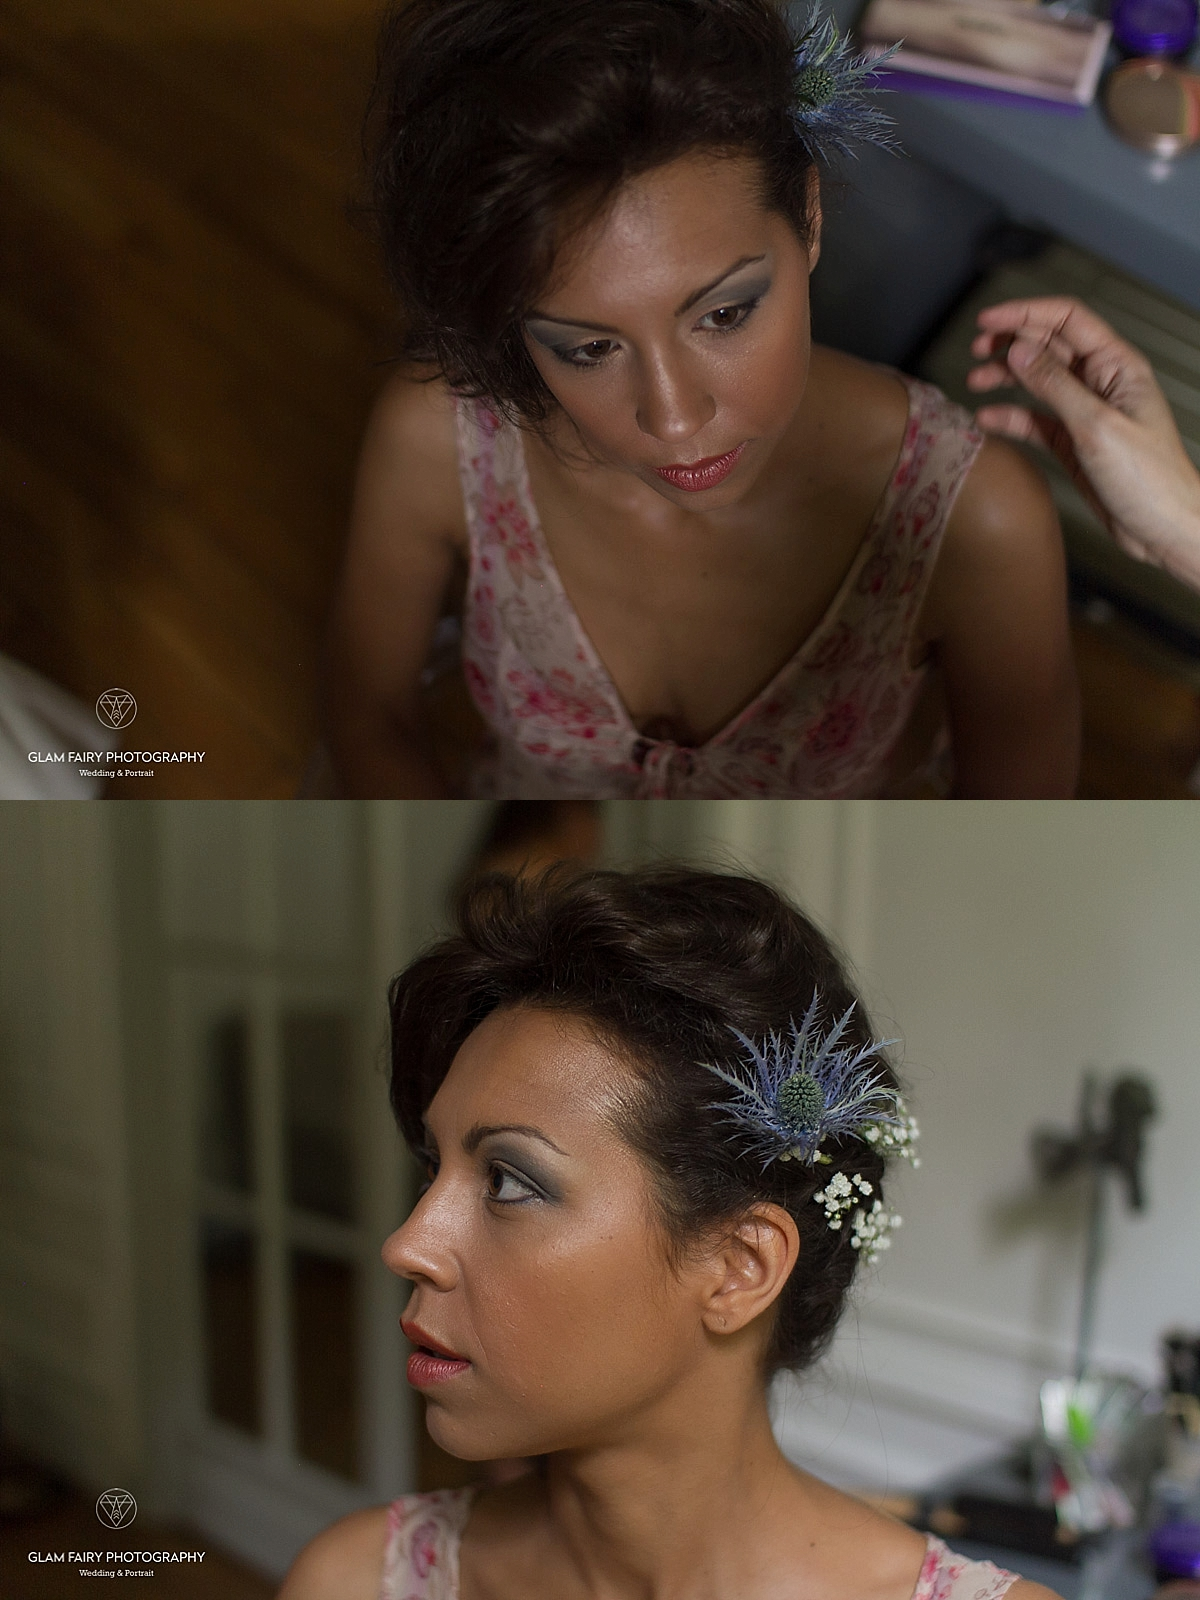 GlamFairyPhotography-sublimer-la-mariee-v4_0015